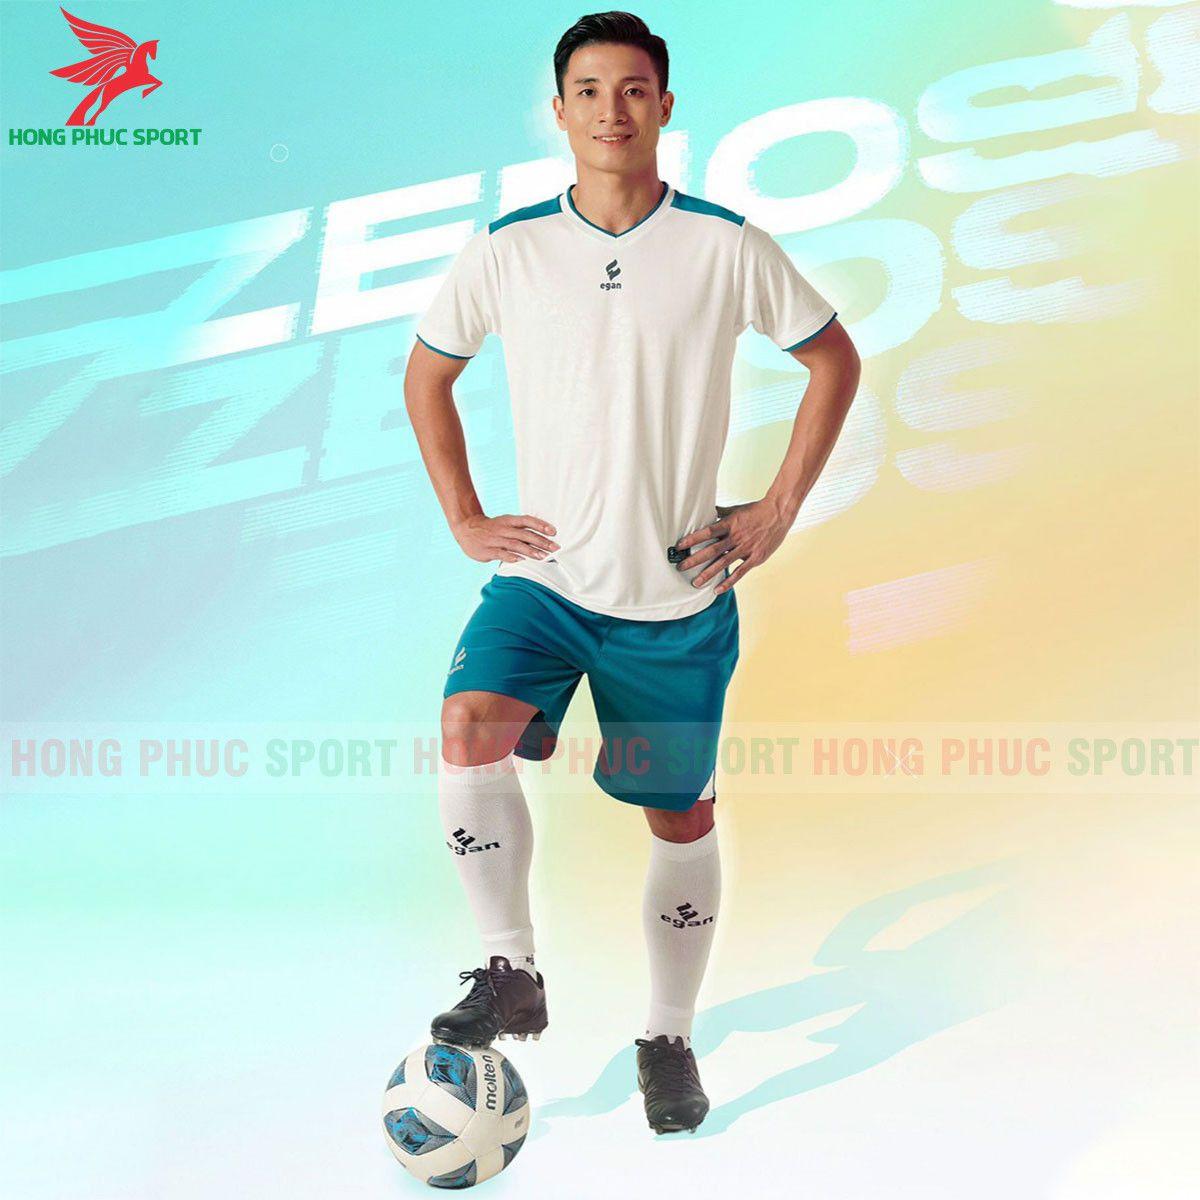 https://cdn.hongphucsport.com/unsafe/s4.shopbay.vn/files/285/ao-bong-da-khong-logo-egan-2021-zenos-trang-60f543641c5fe.jpg